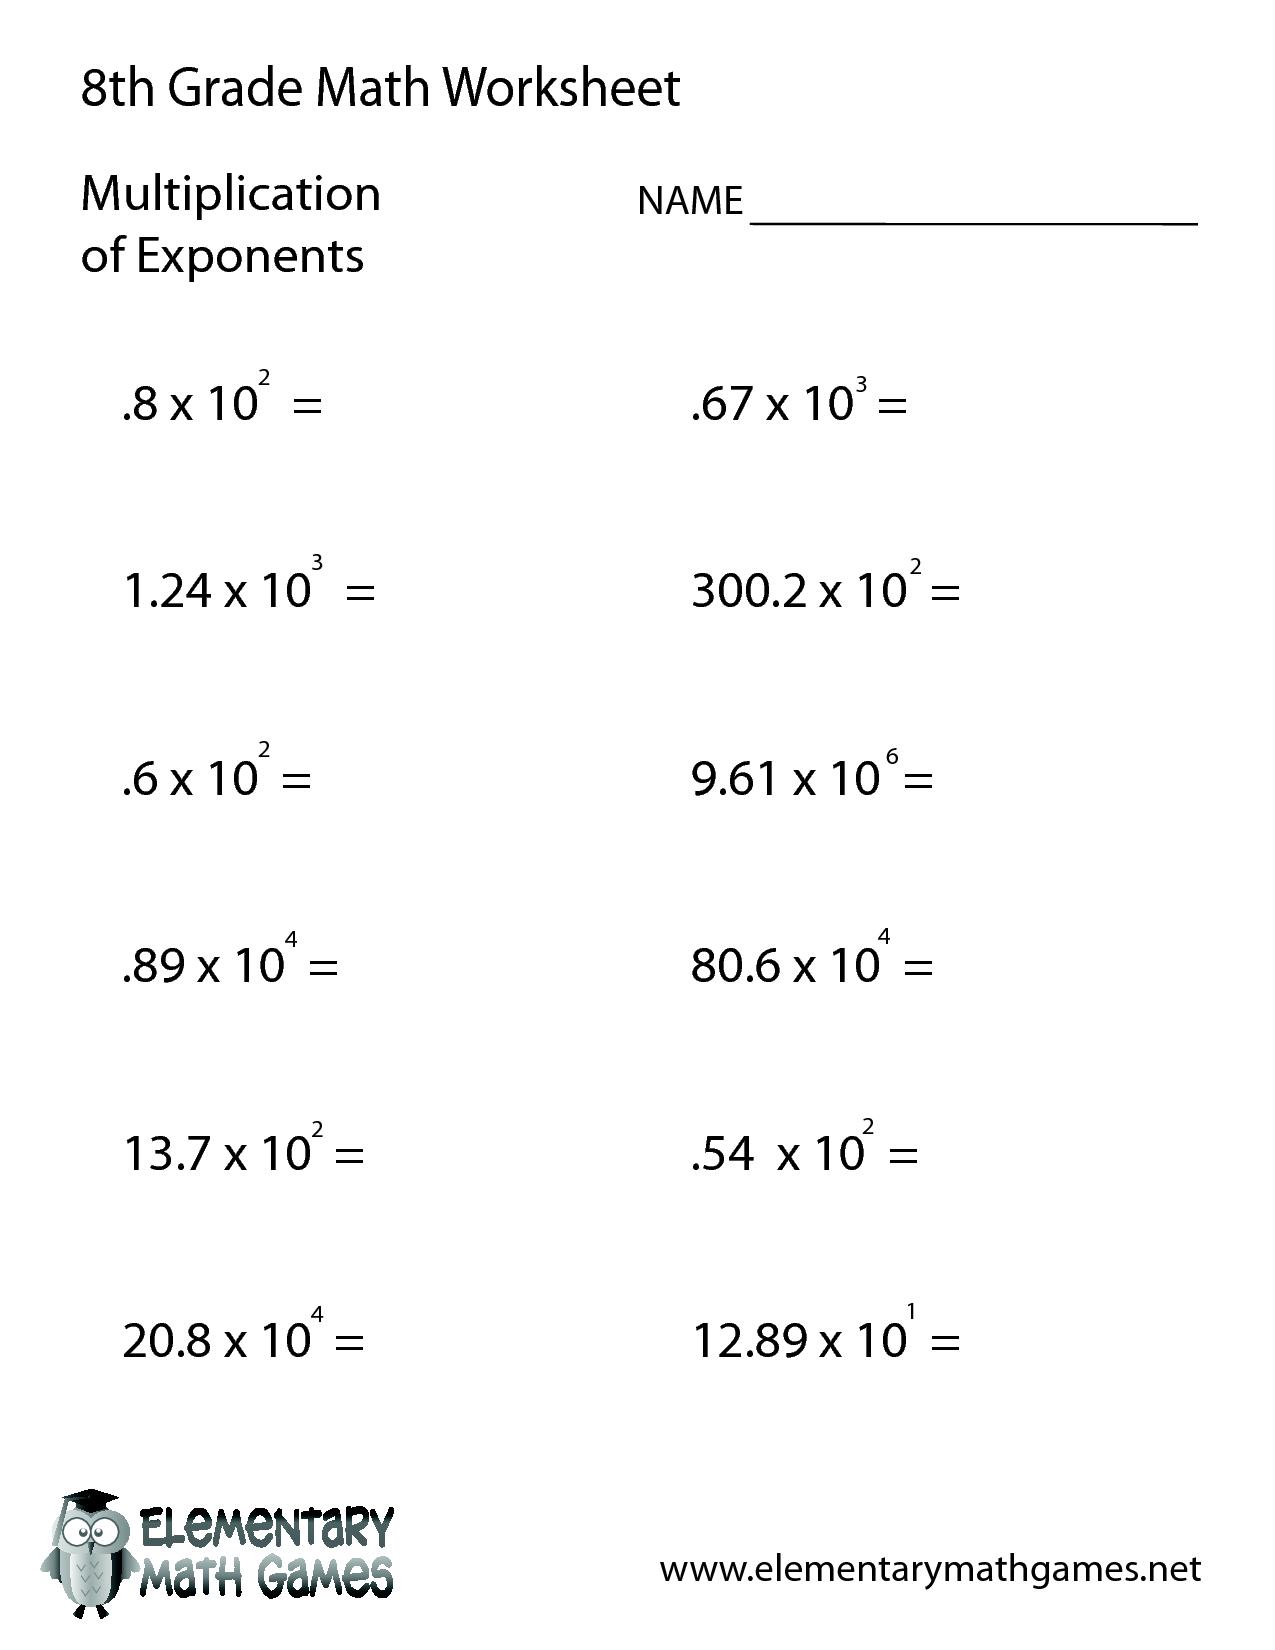 8 Best Images Of 8th Grade Printable Worksheets  8th Grade Math Problems Worksheets, 8th Grade